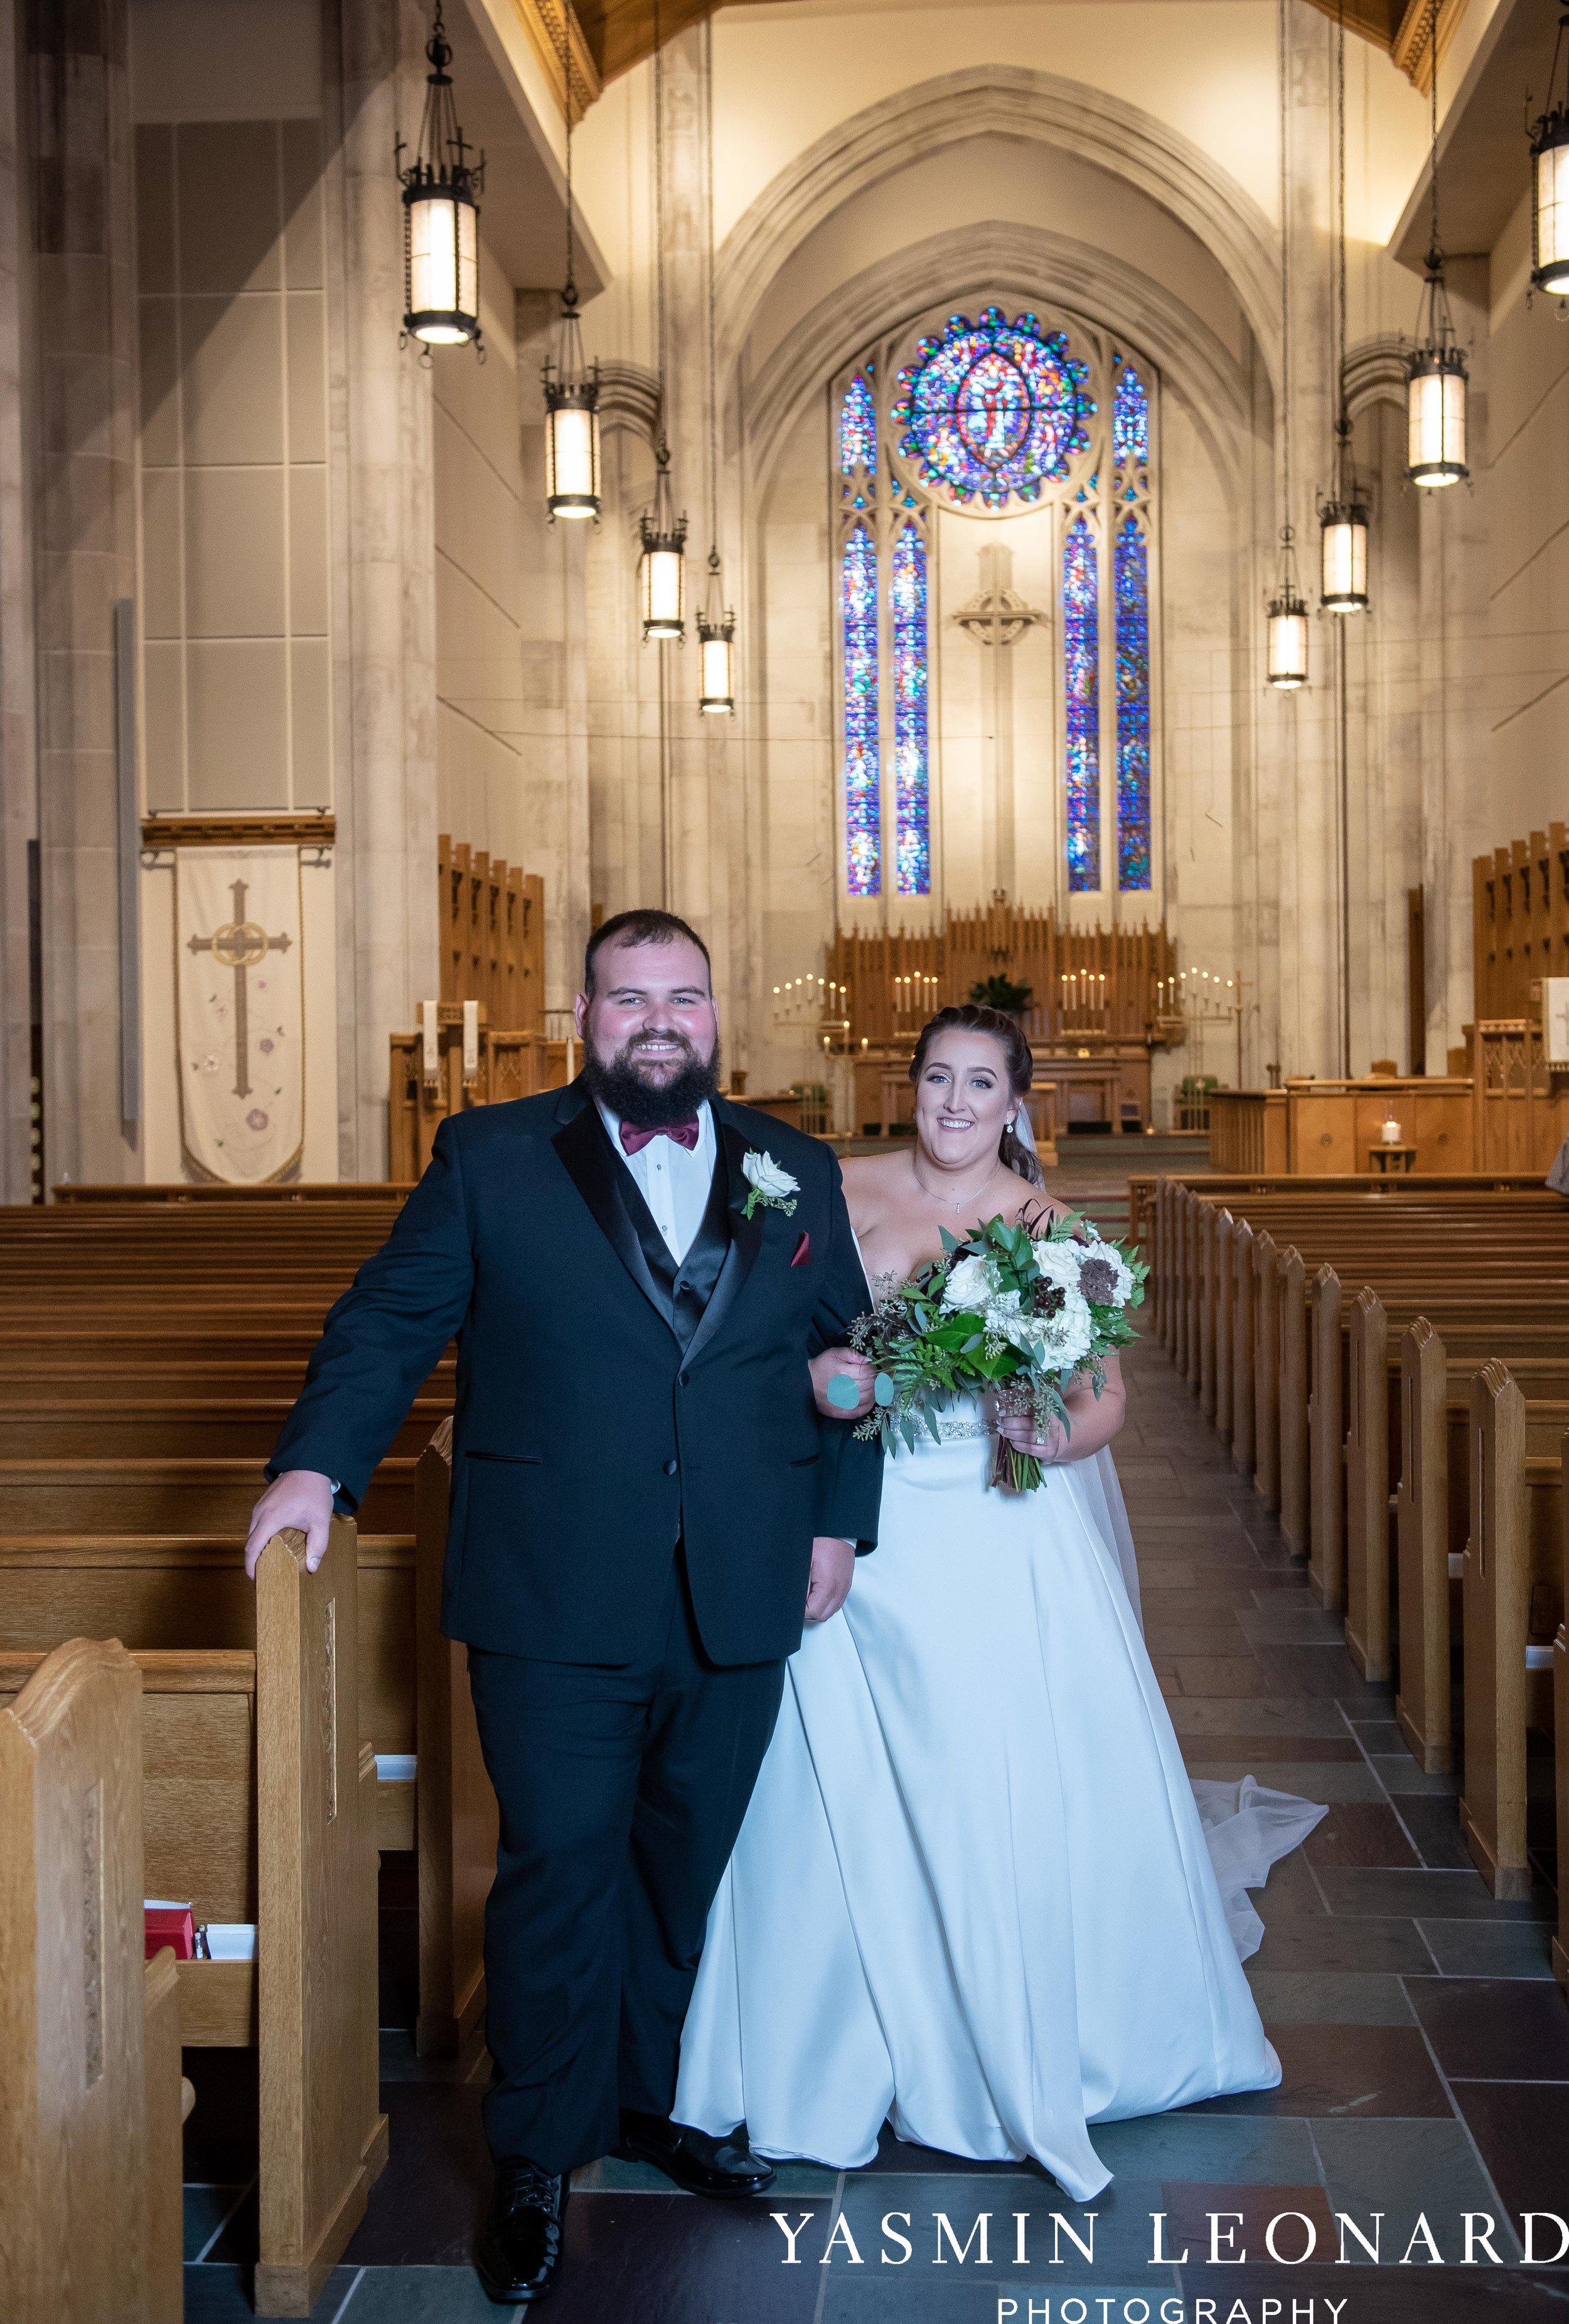 Wesley Memorial United Methodist Church - Old Homeplace Winery - High Point Weddings - High Point Wedding Photographer - NC Weddings - NC Barn Venue - Yasmin Leonard Photography-24.jpg